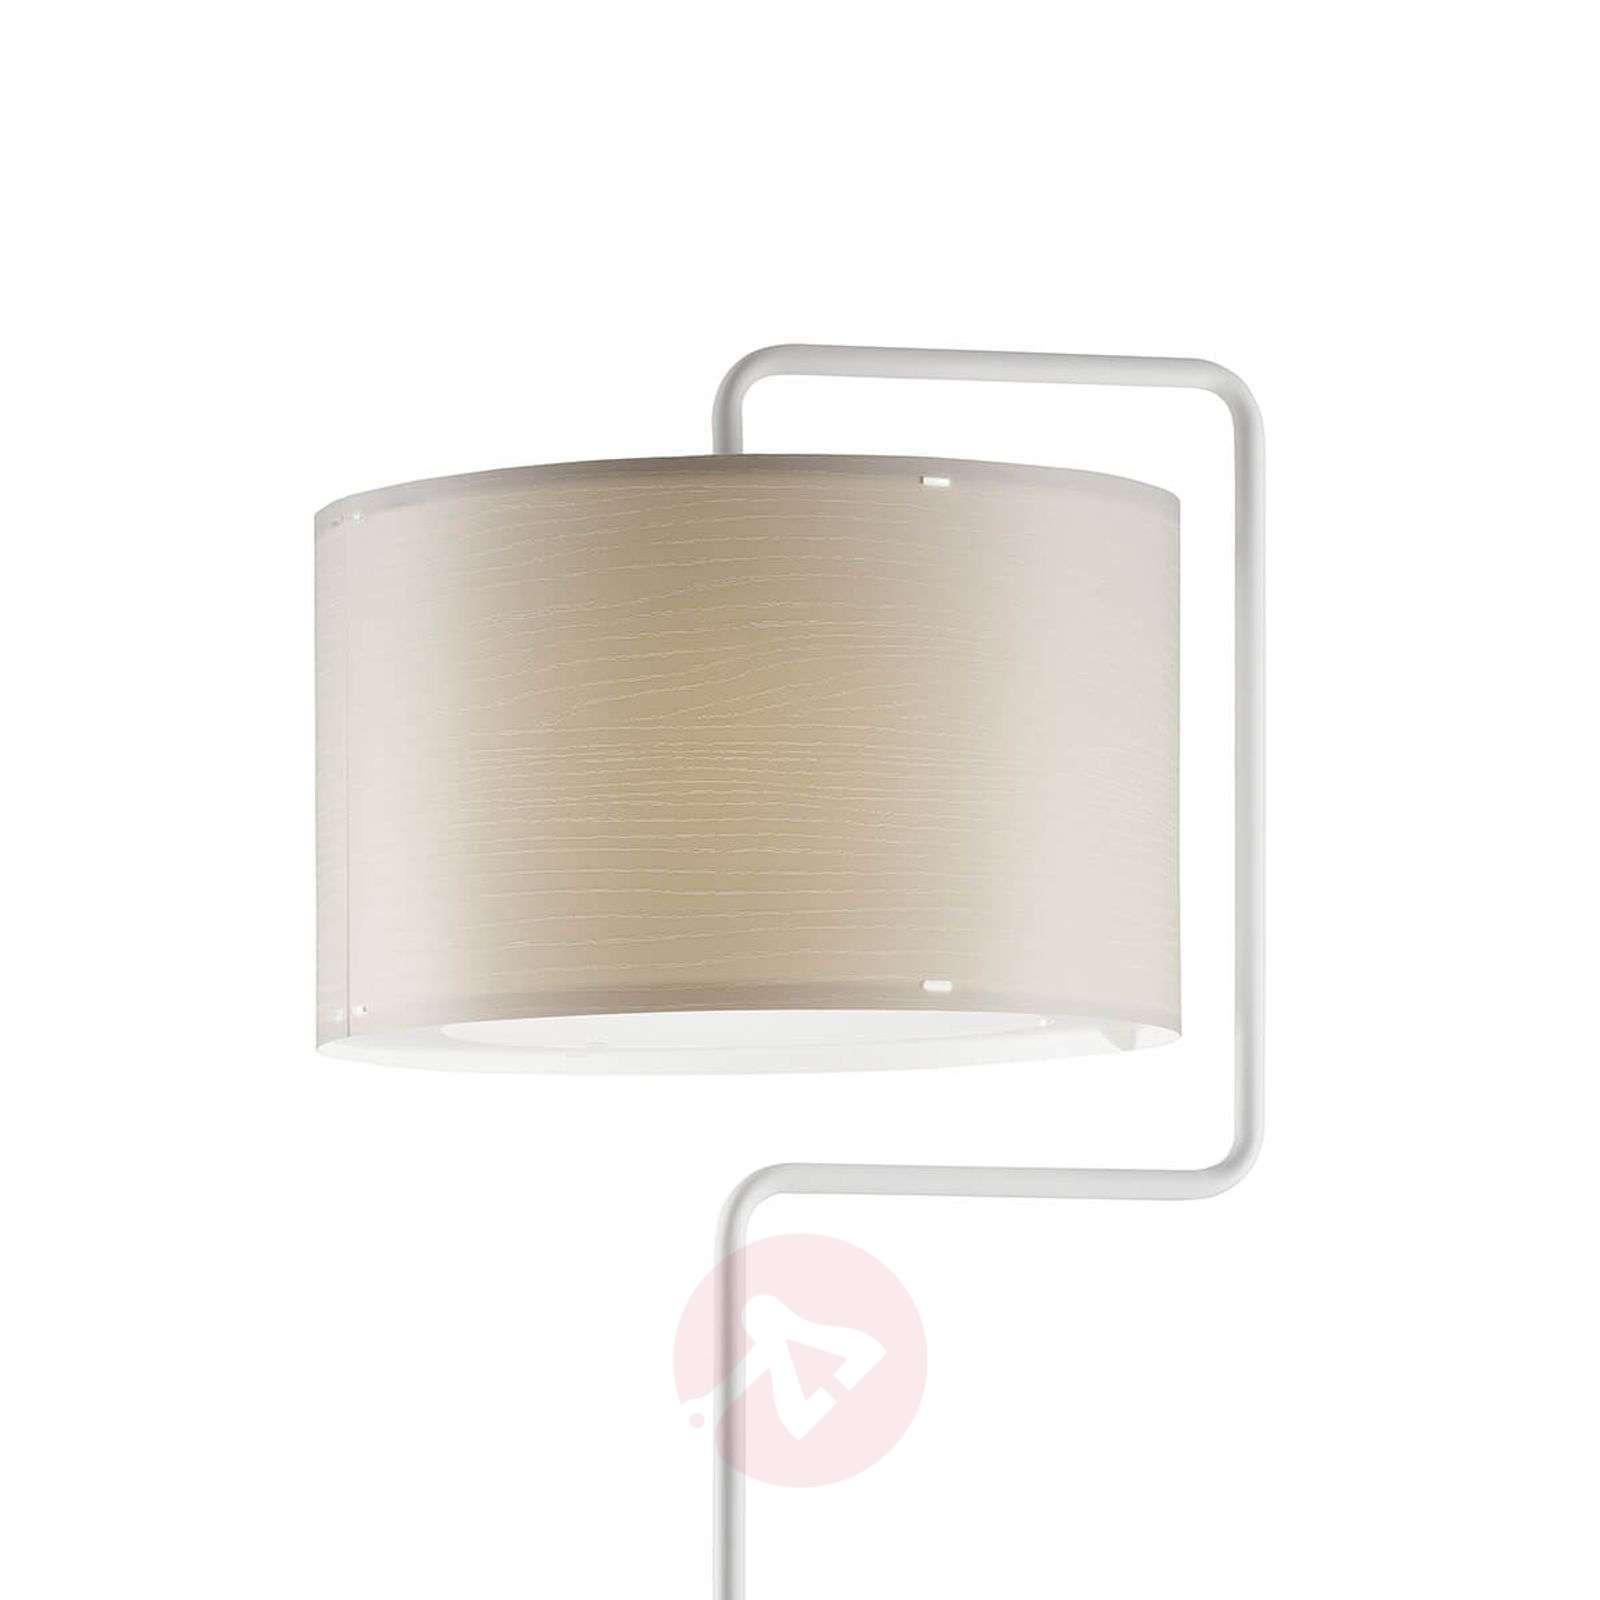 Cream coloured floor lamp morfeo lights cream coloured floor lamp morfeo 1056093 05 aloadofball Choice Image